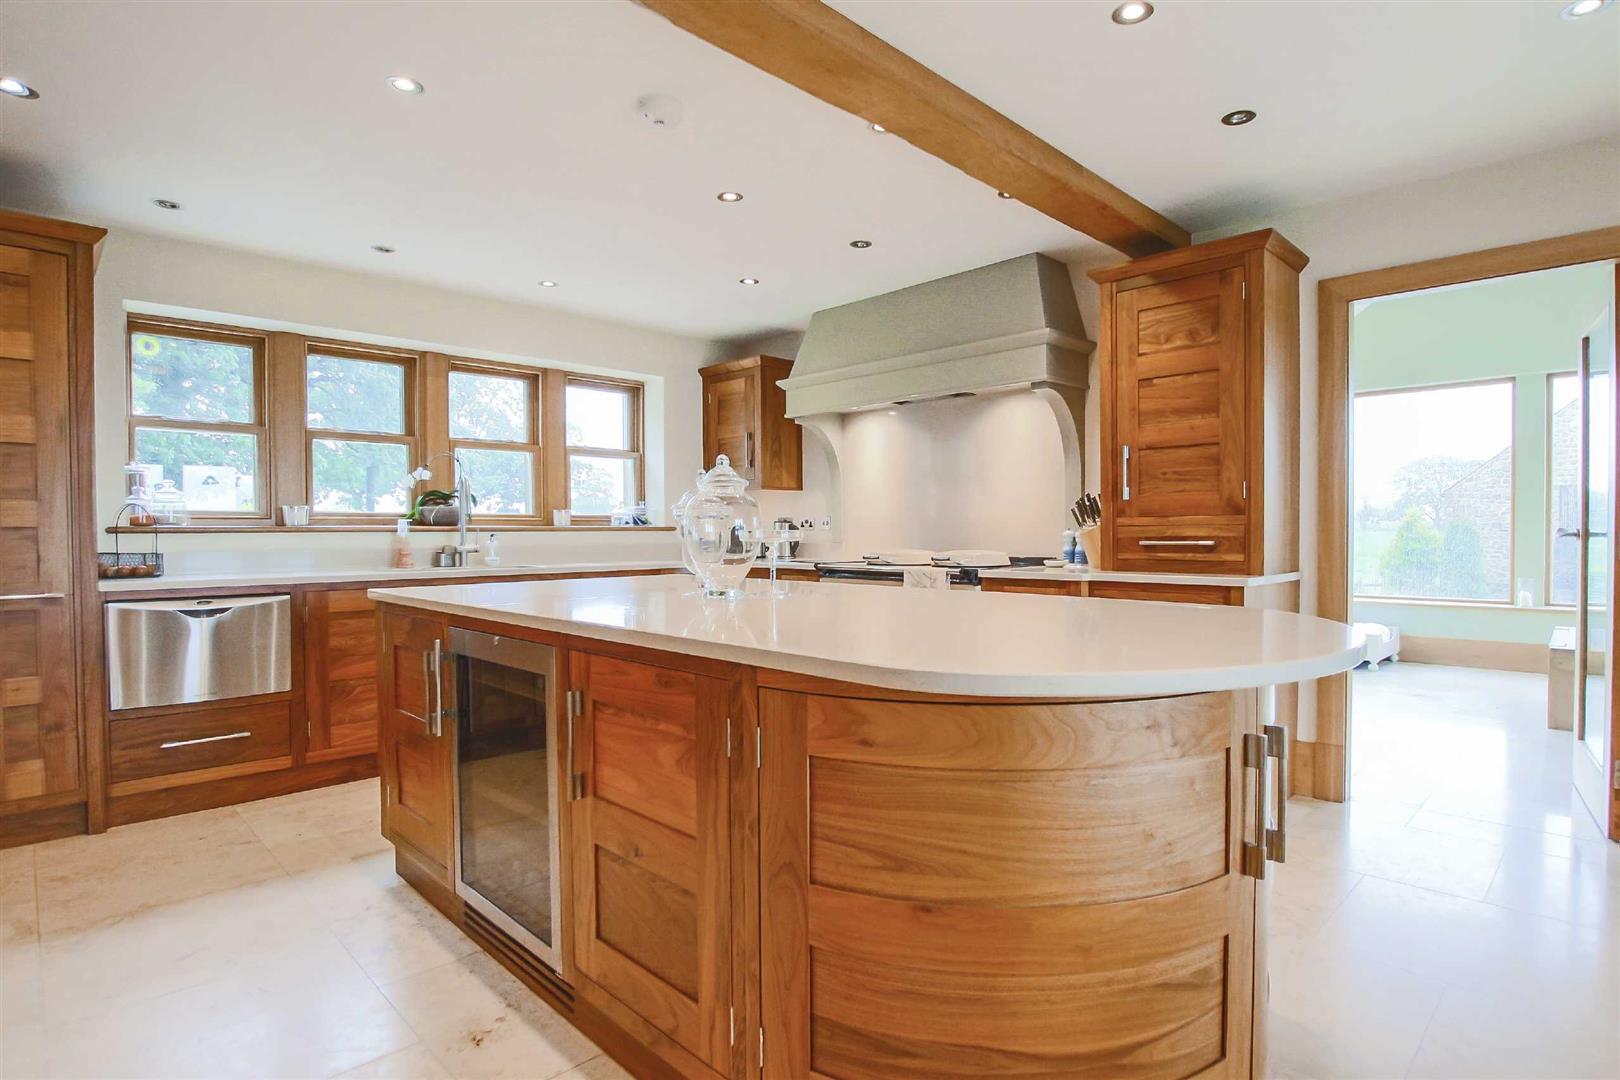 4 Bedroom Detached House For Sale - Image 2